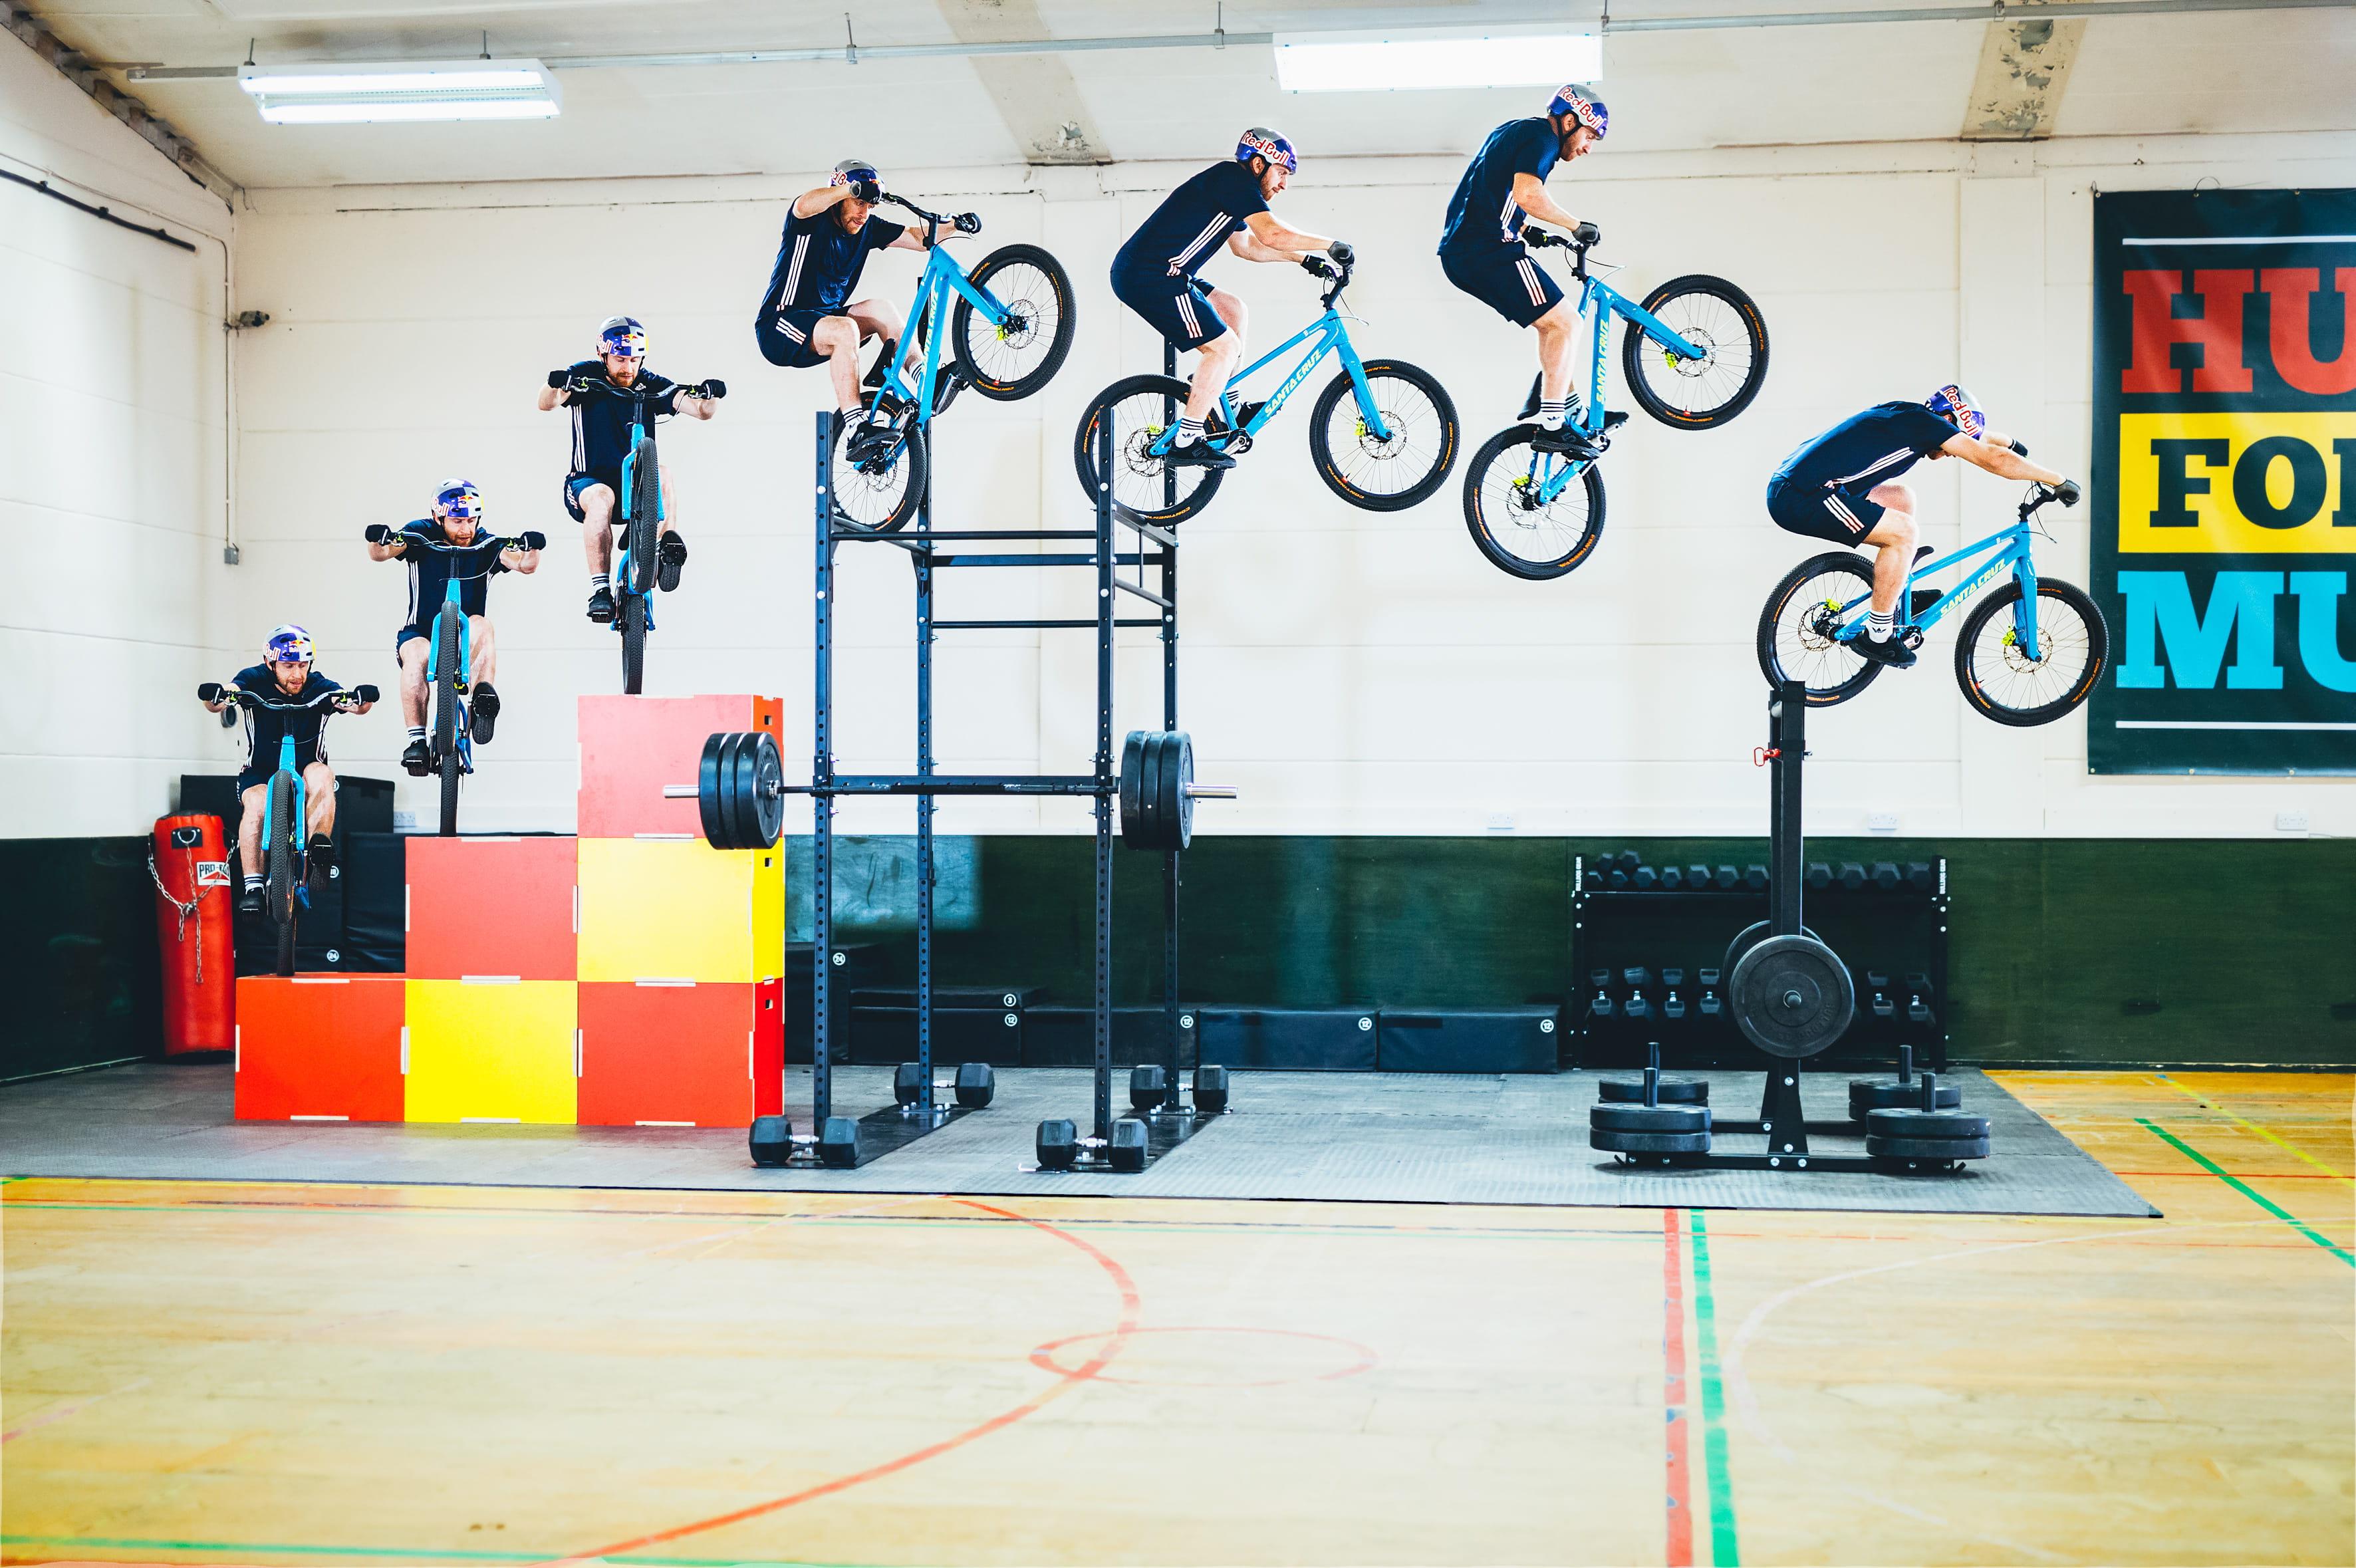 Danny-MacAskill_Gymnasium_-c-_RedBullContentPool_Fred_Murray-7